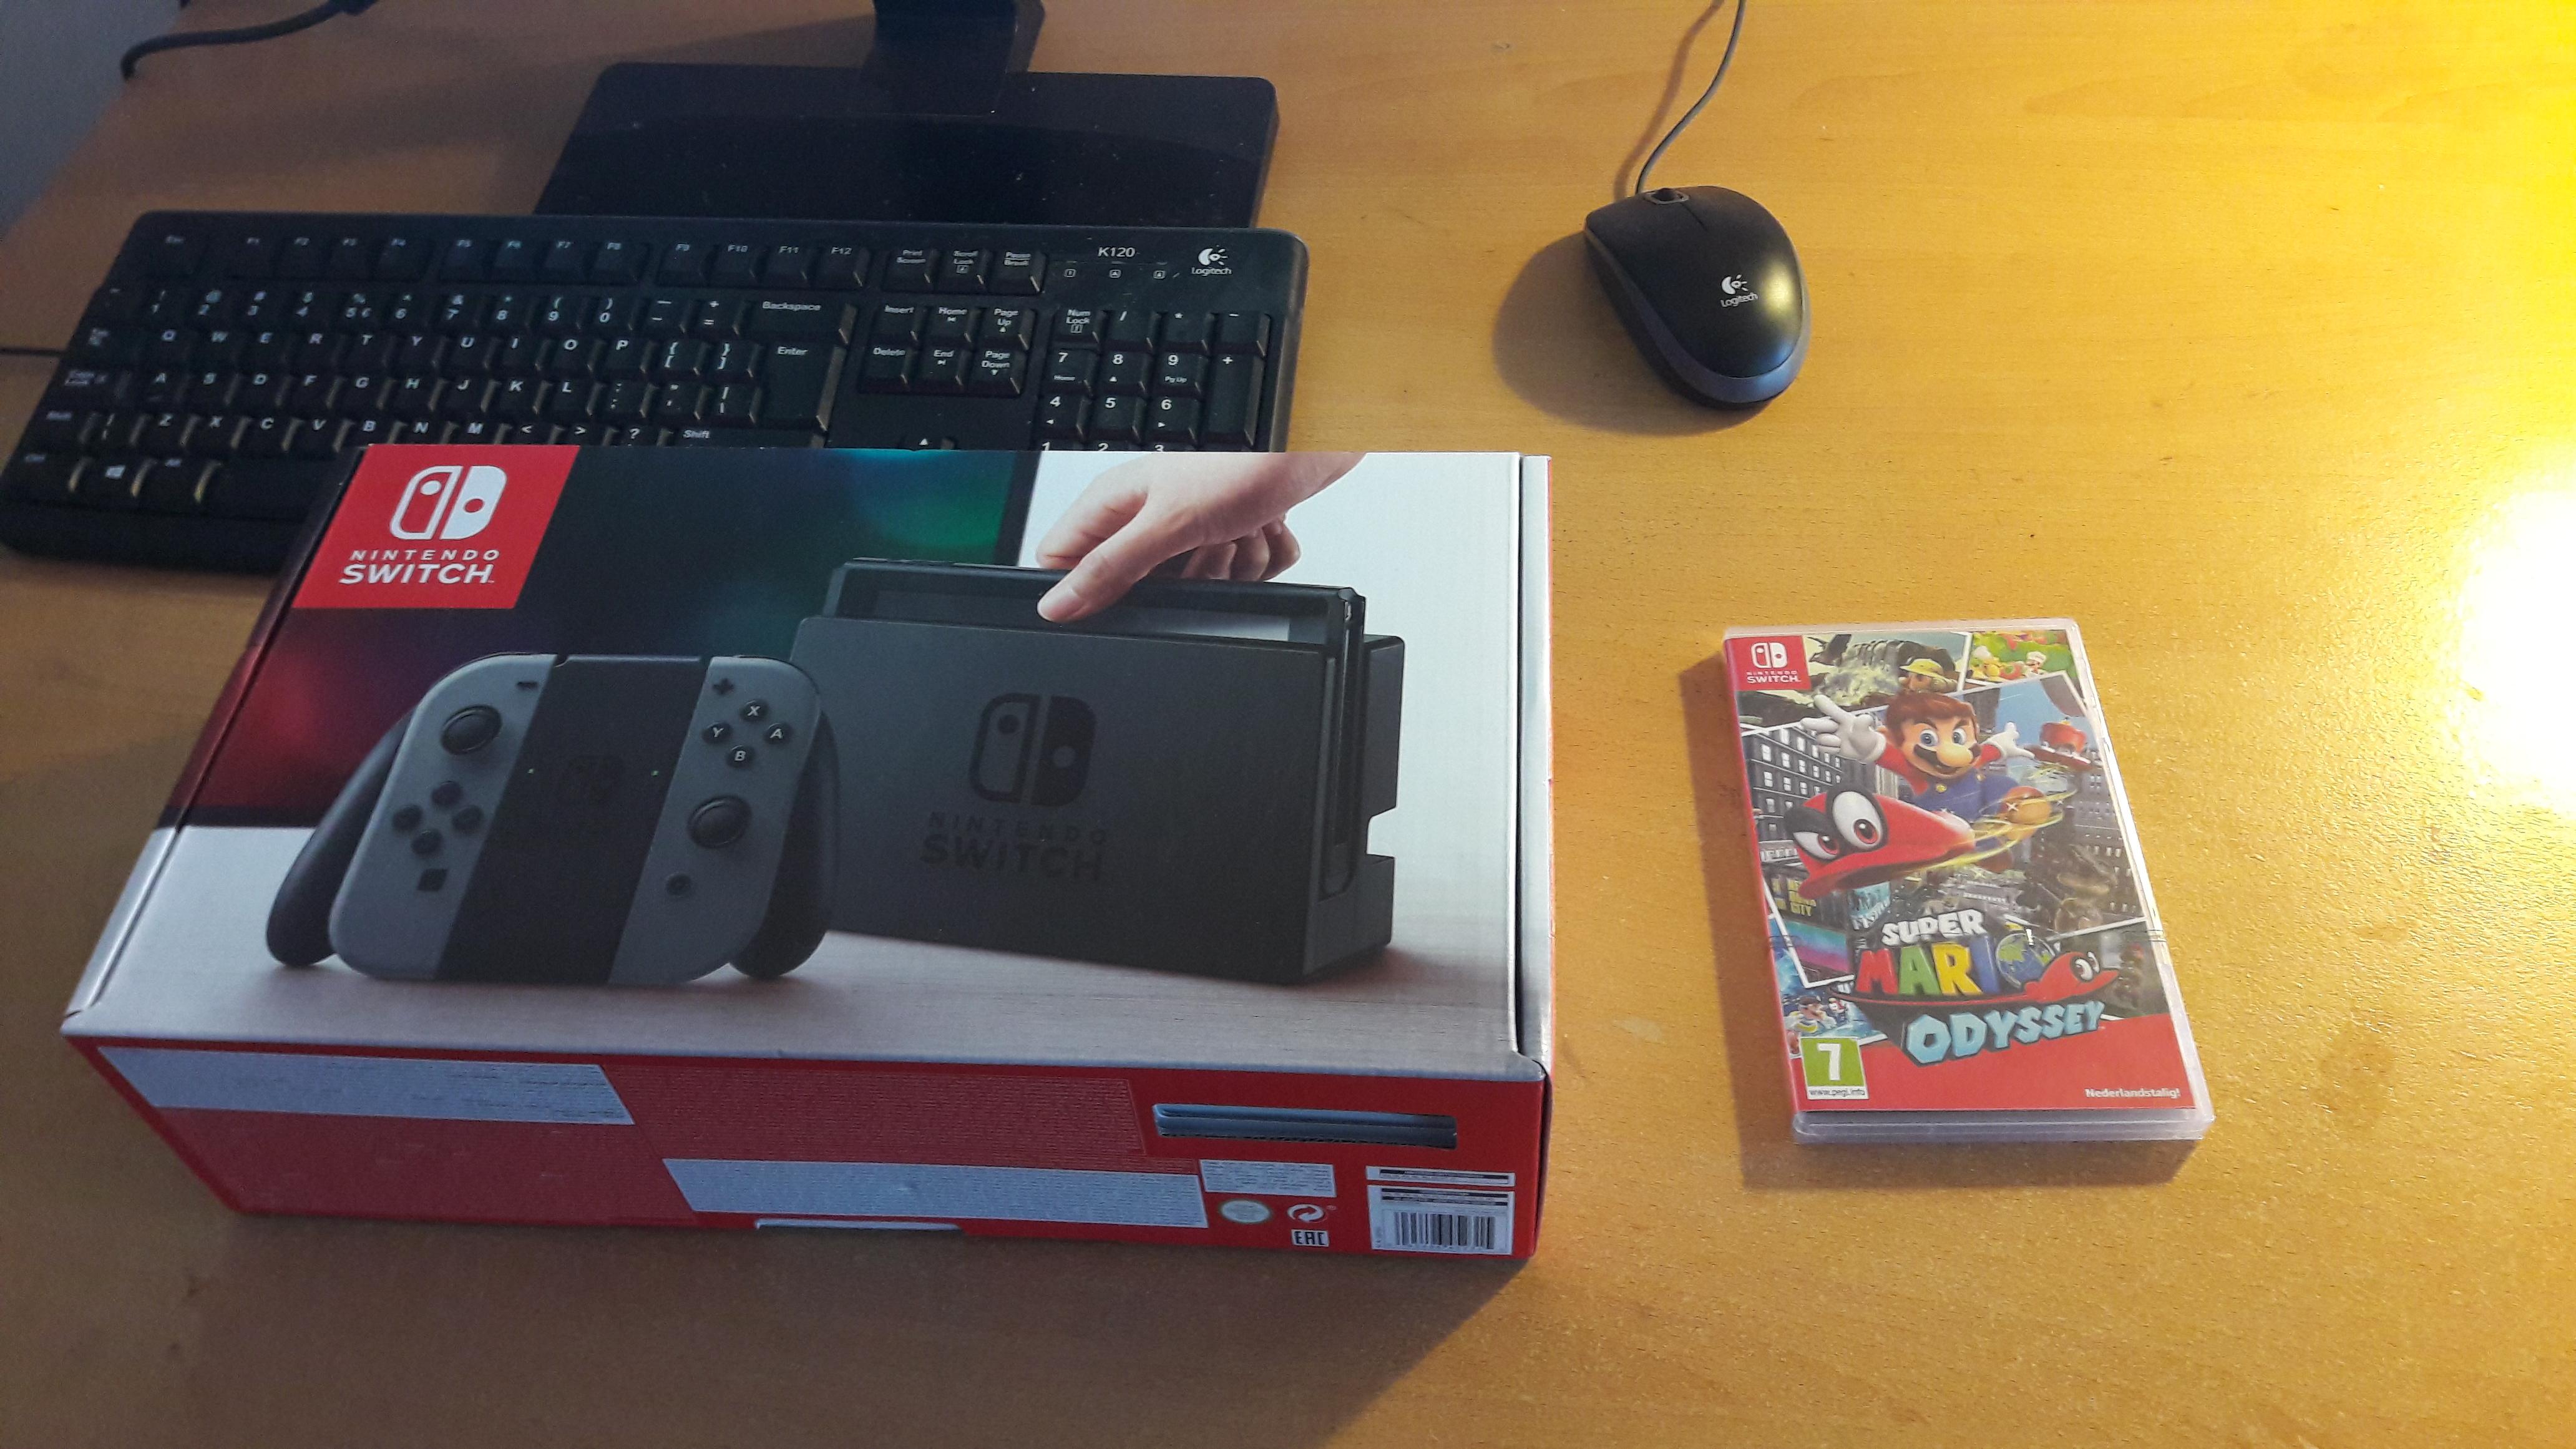 Nintendo Switch box and Super Mario Odyssey